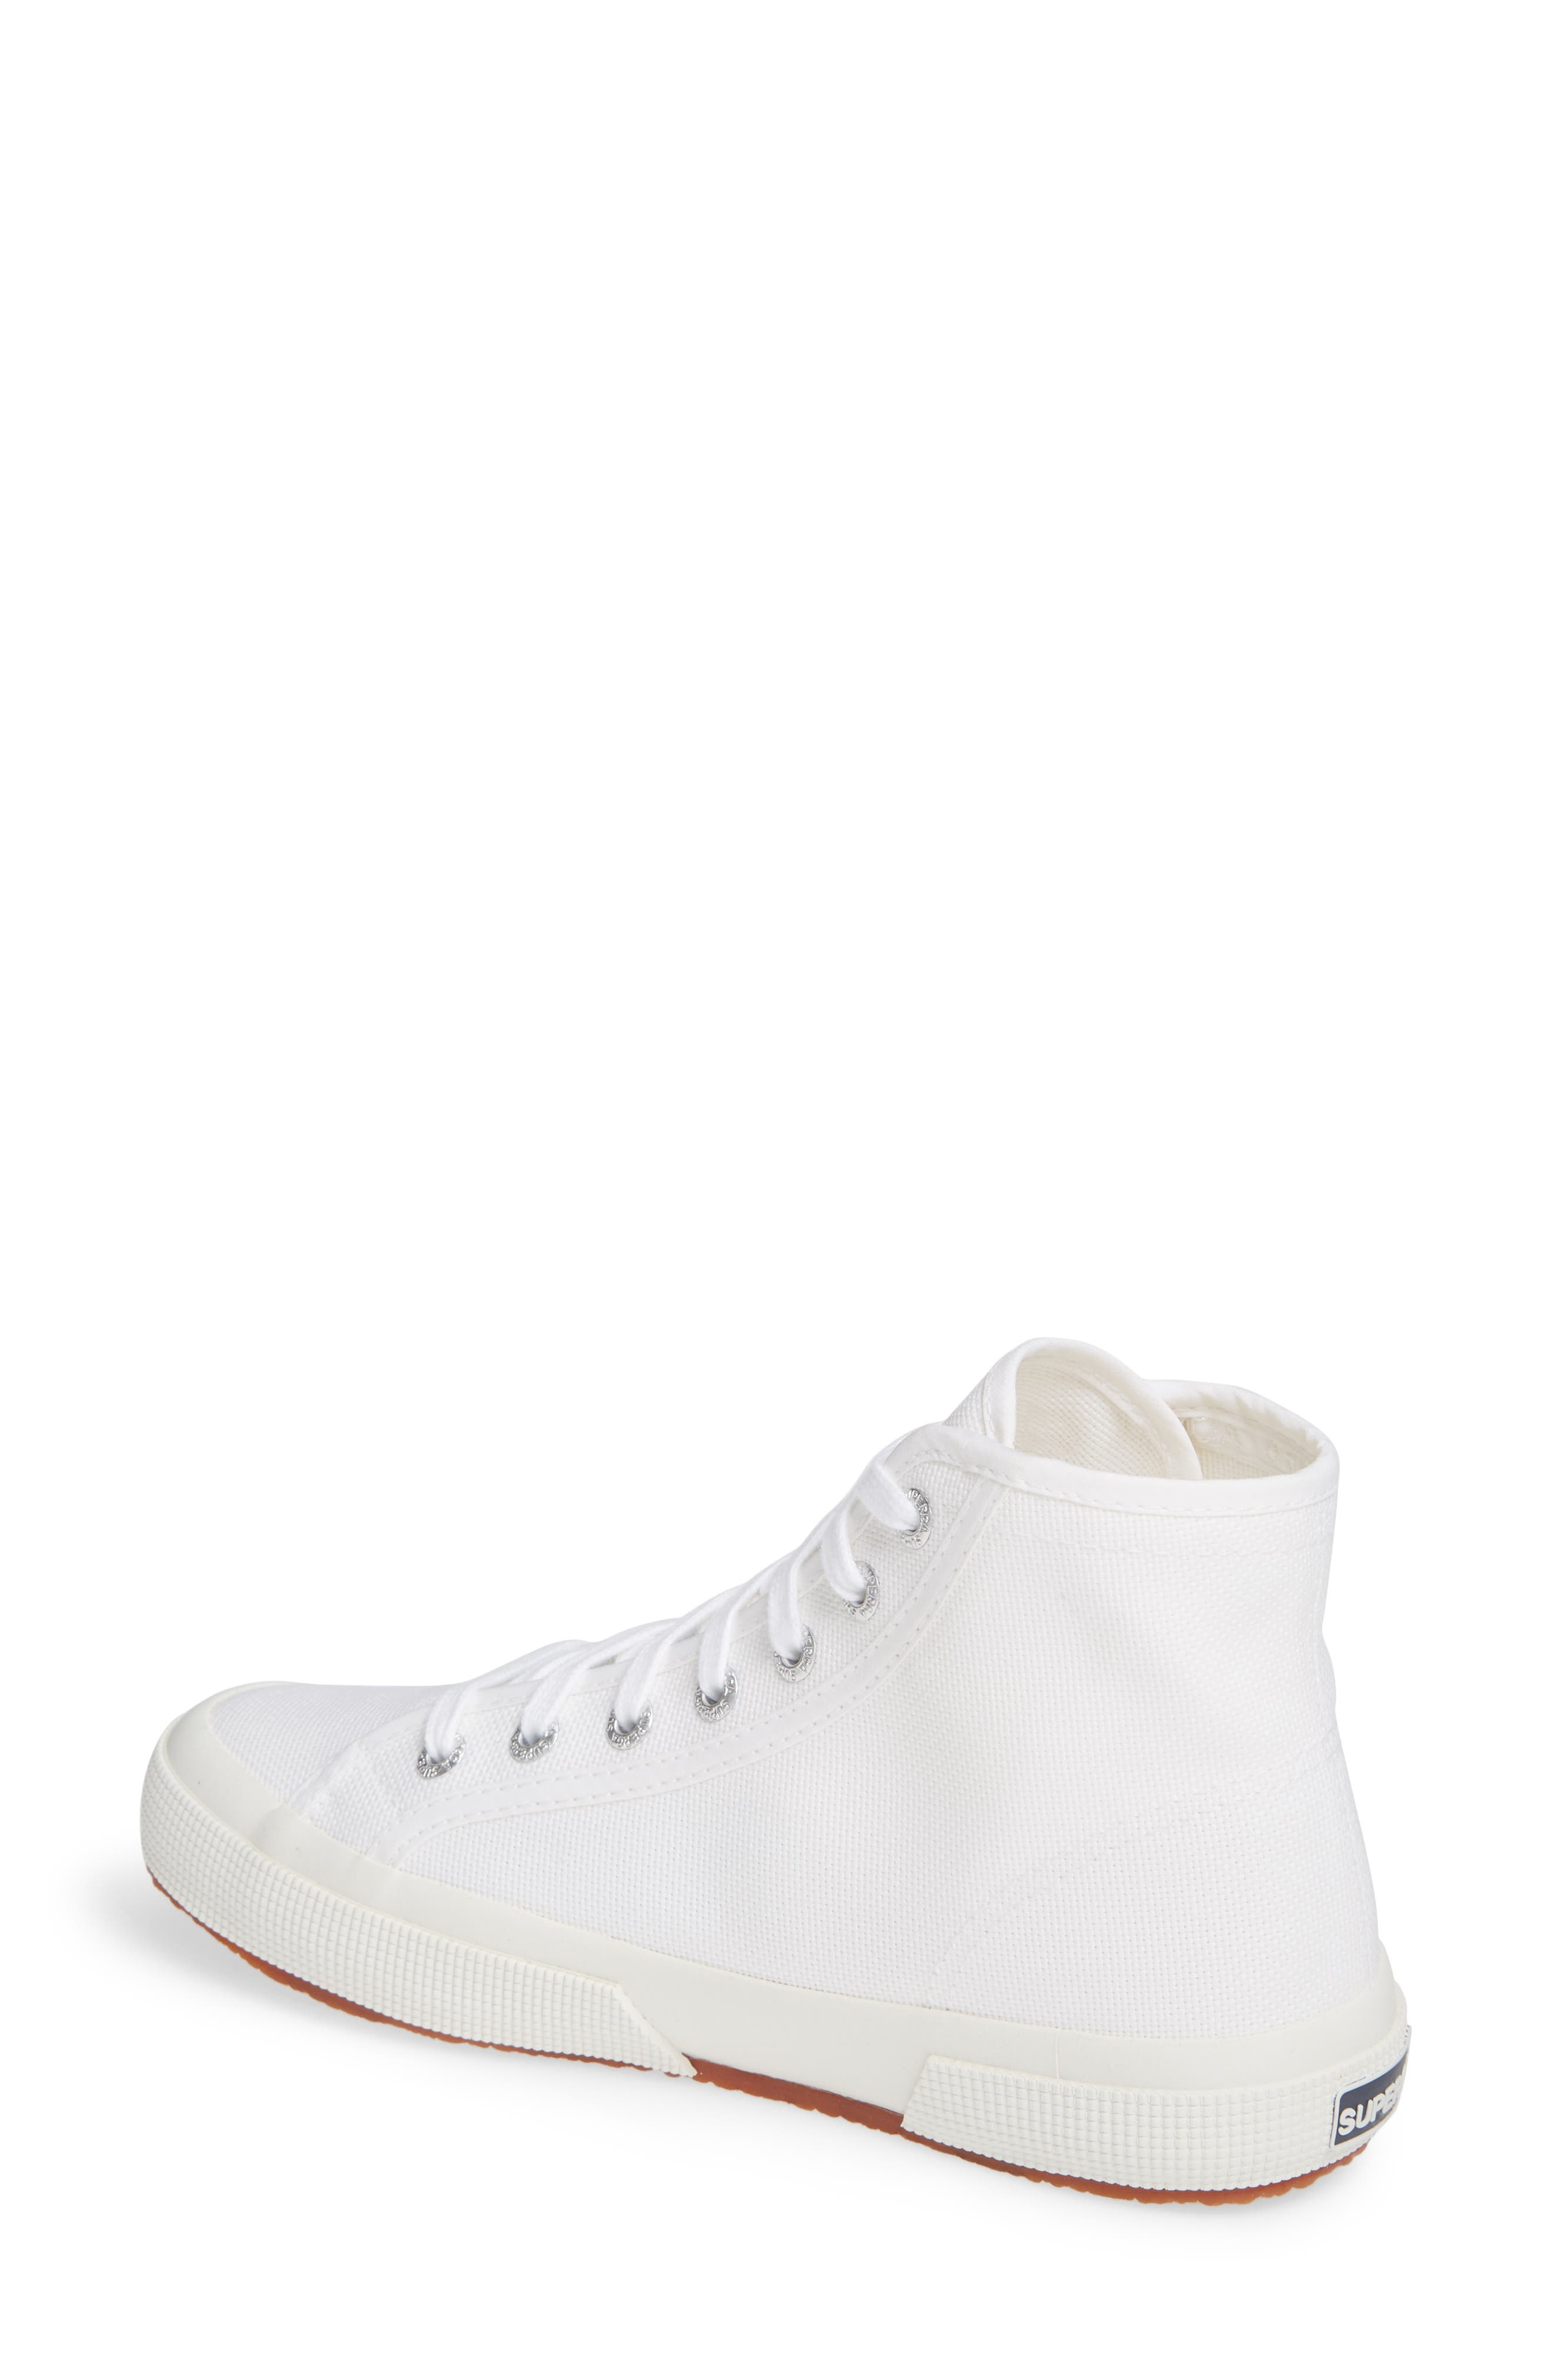 2795 High Top Sneaker,                             Alternate thumbnail 2, color,                             WHITE